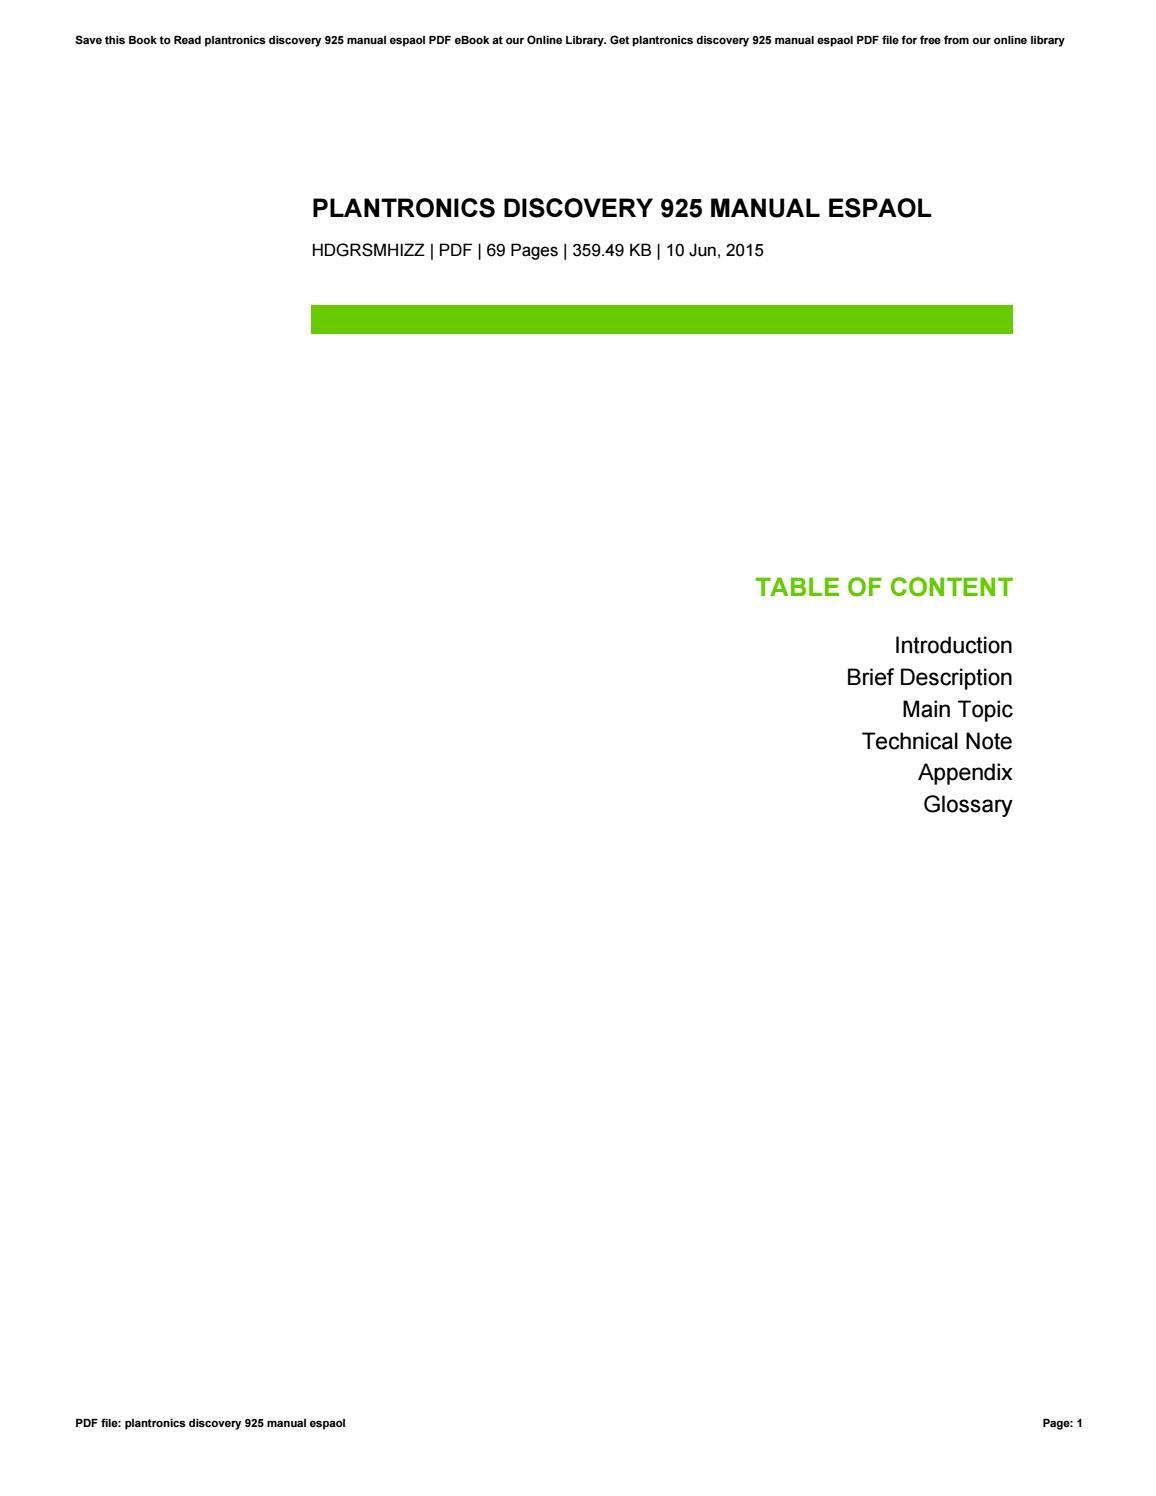 Plantronics discovery 925 инструкция